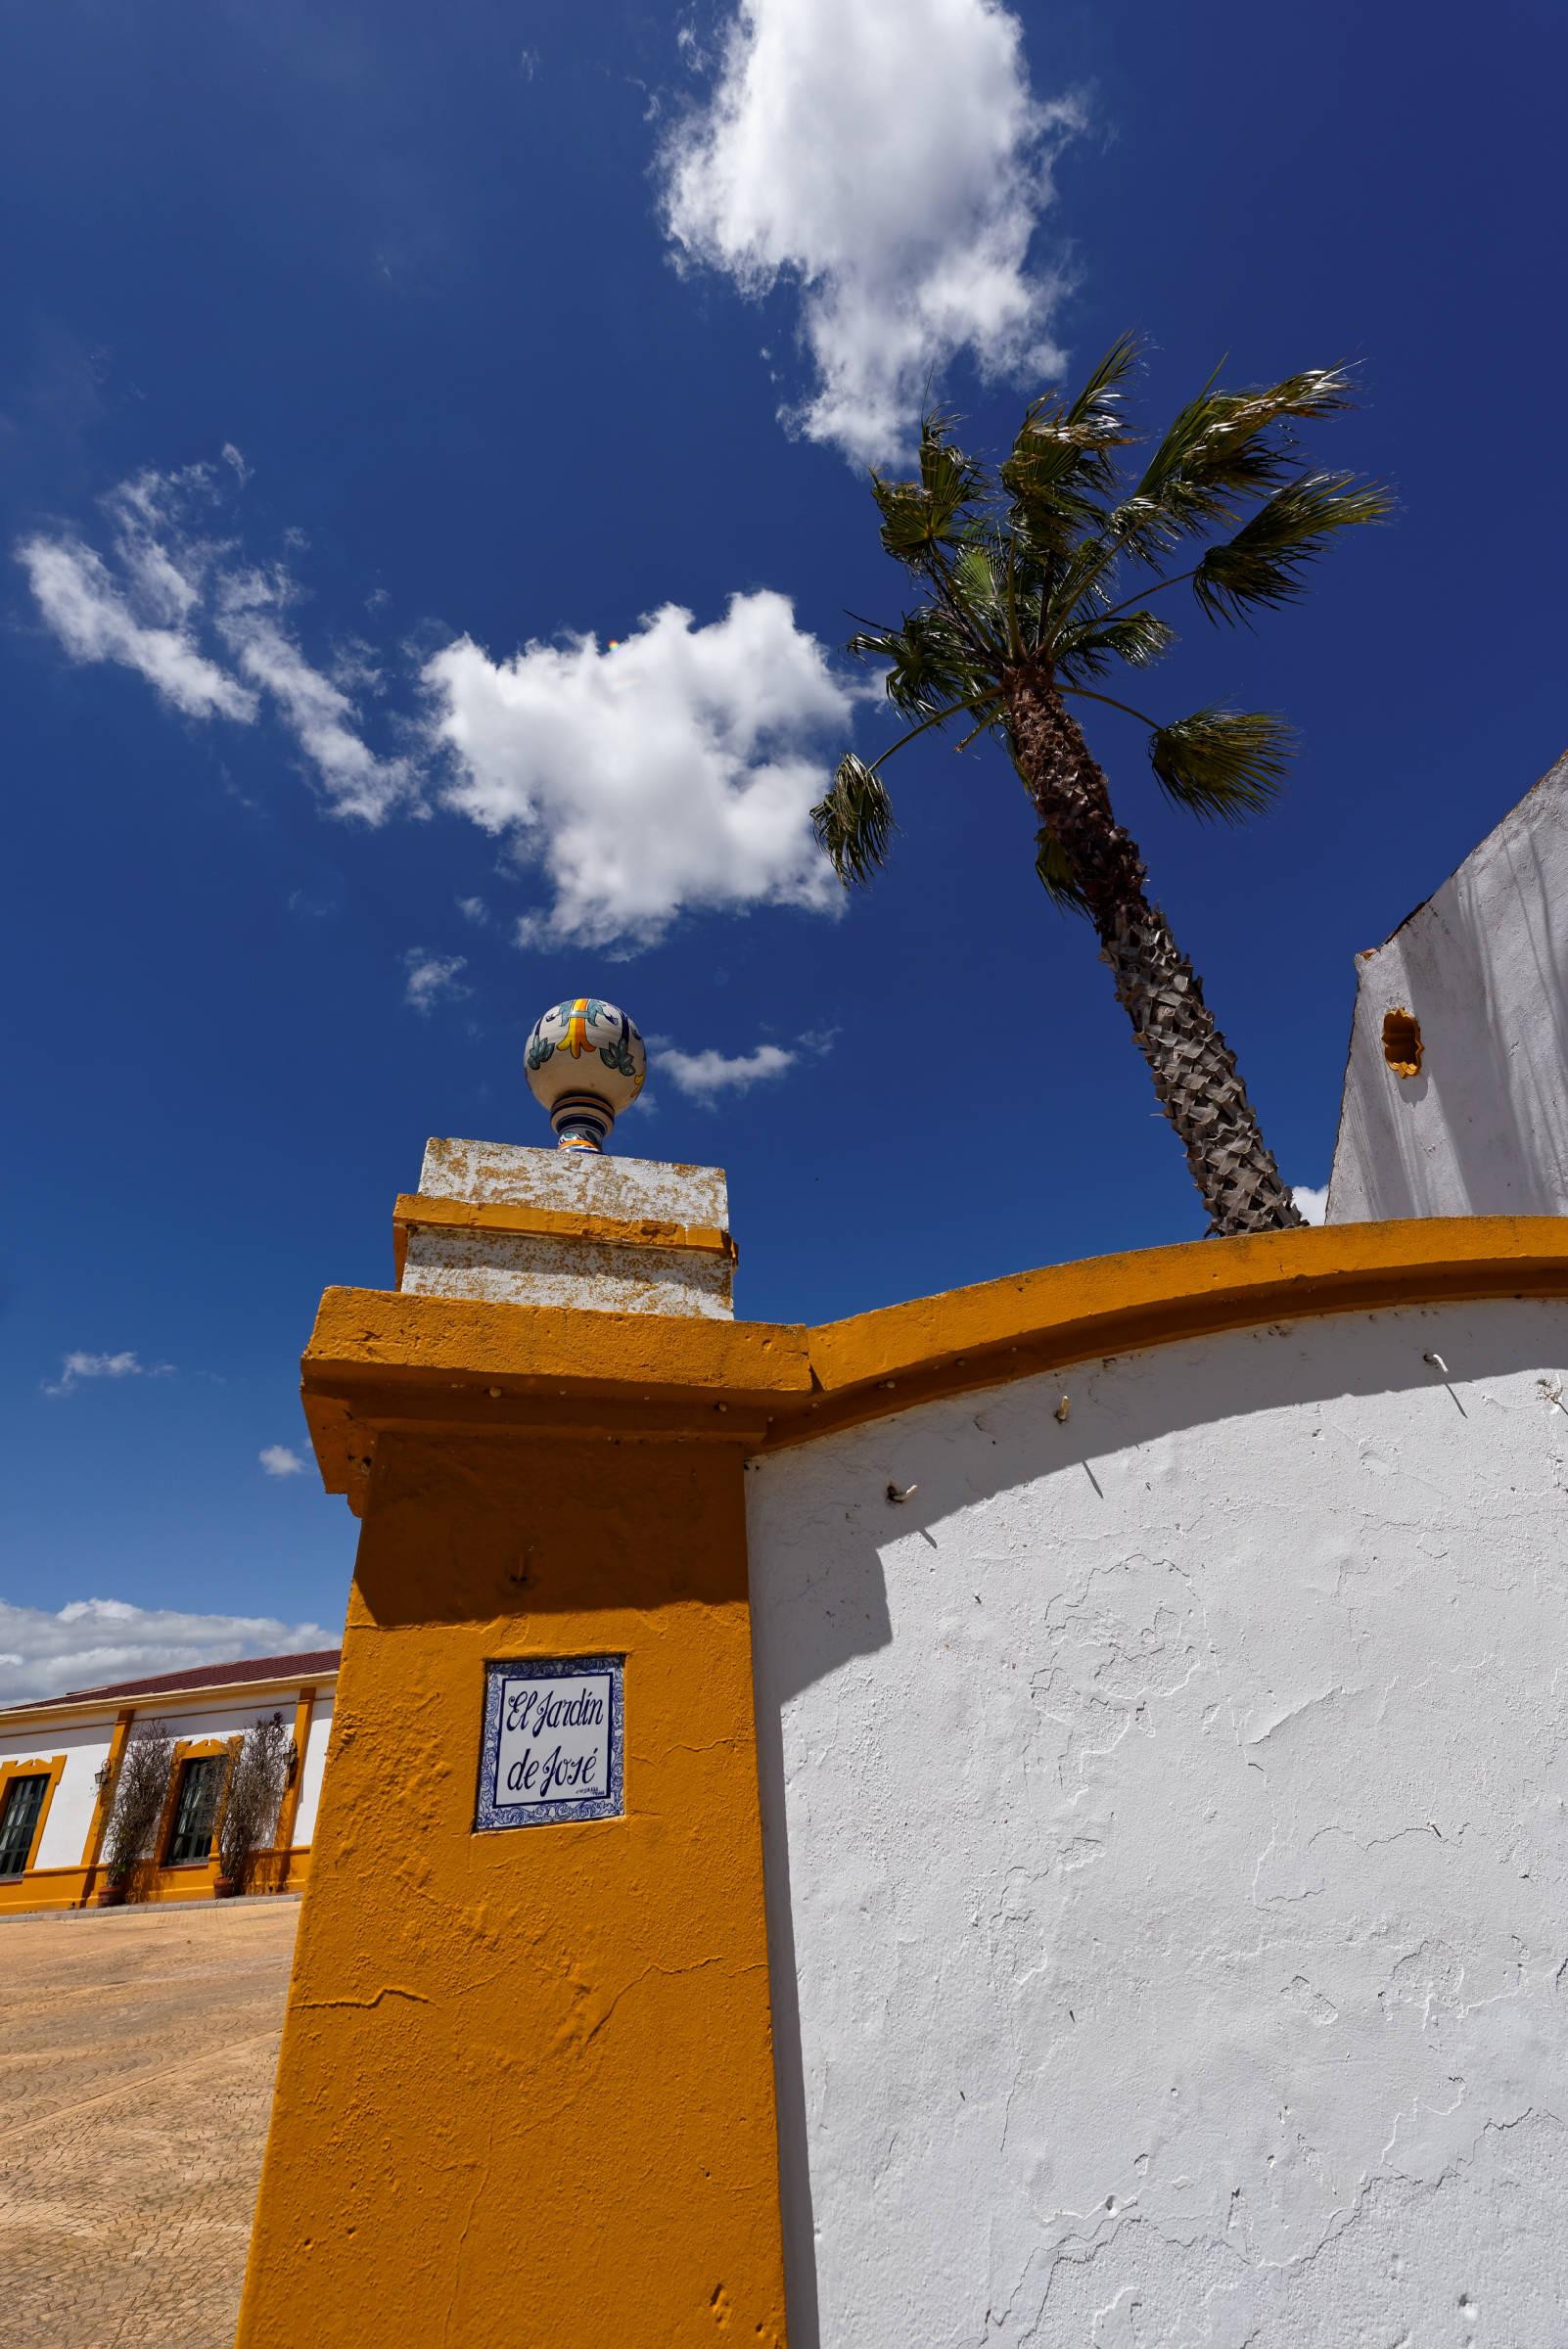 160414-Isla minima - Escobar (Andalousie) (46)